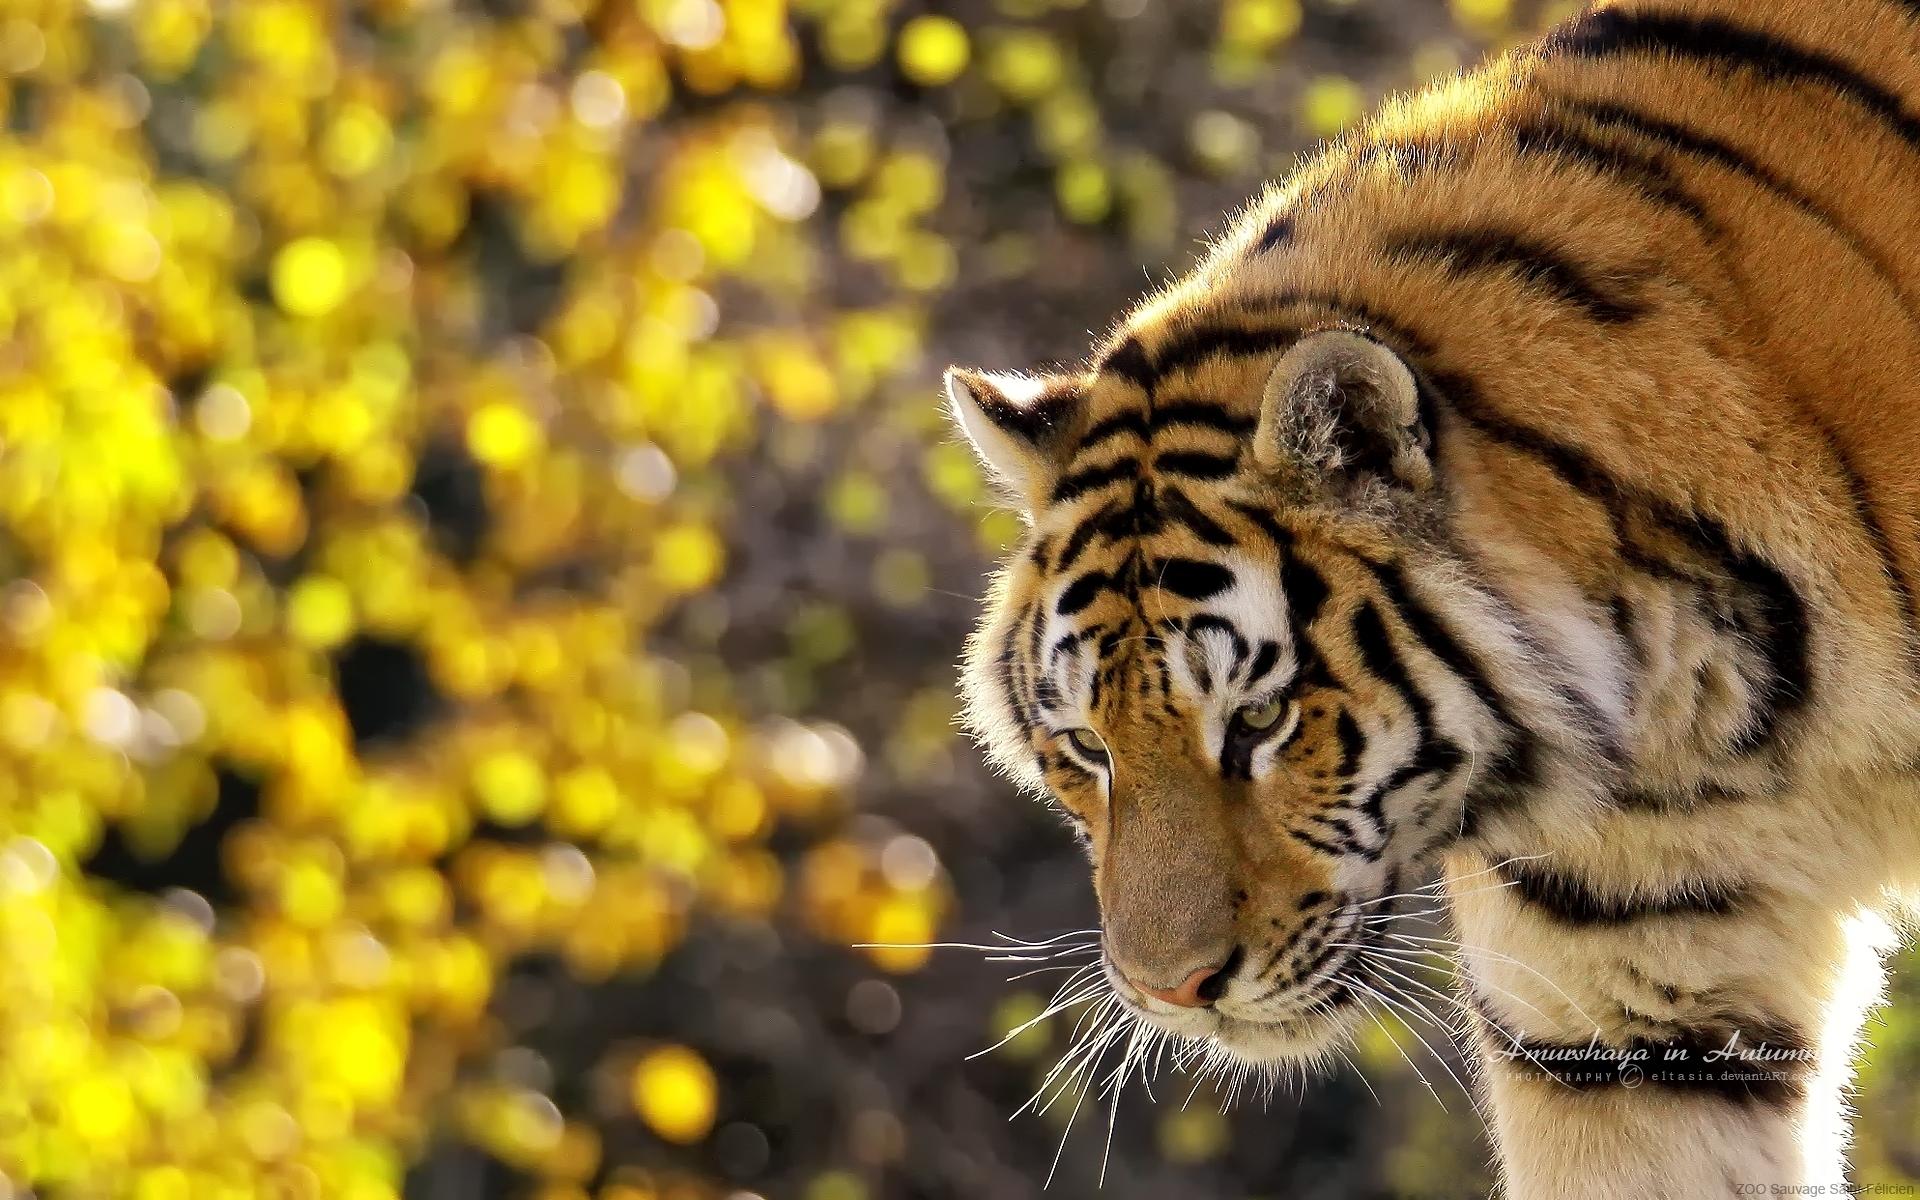 Free Hd Tiger Animal Wallpapers Download